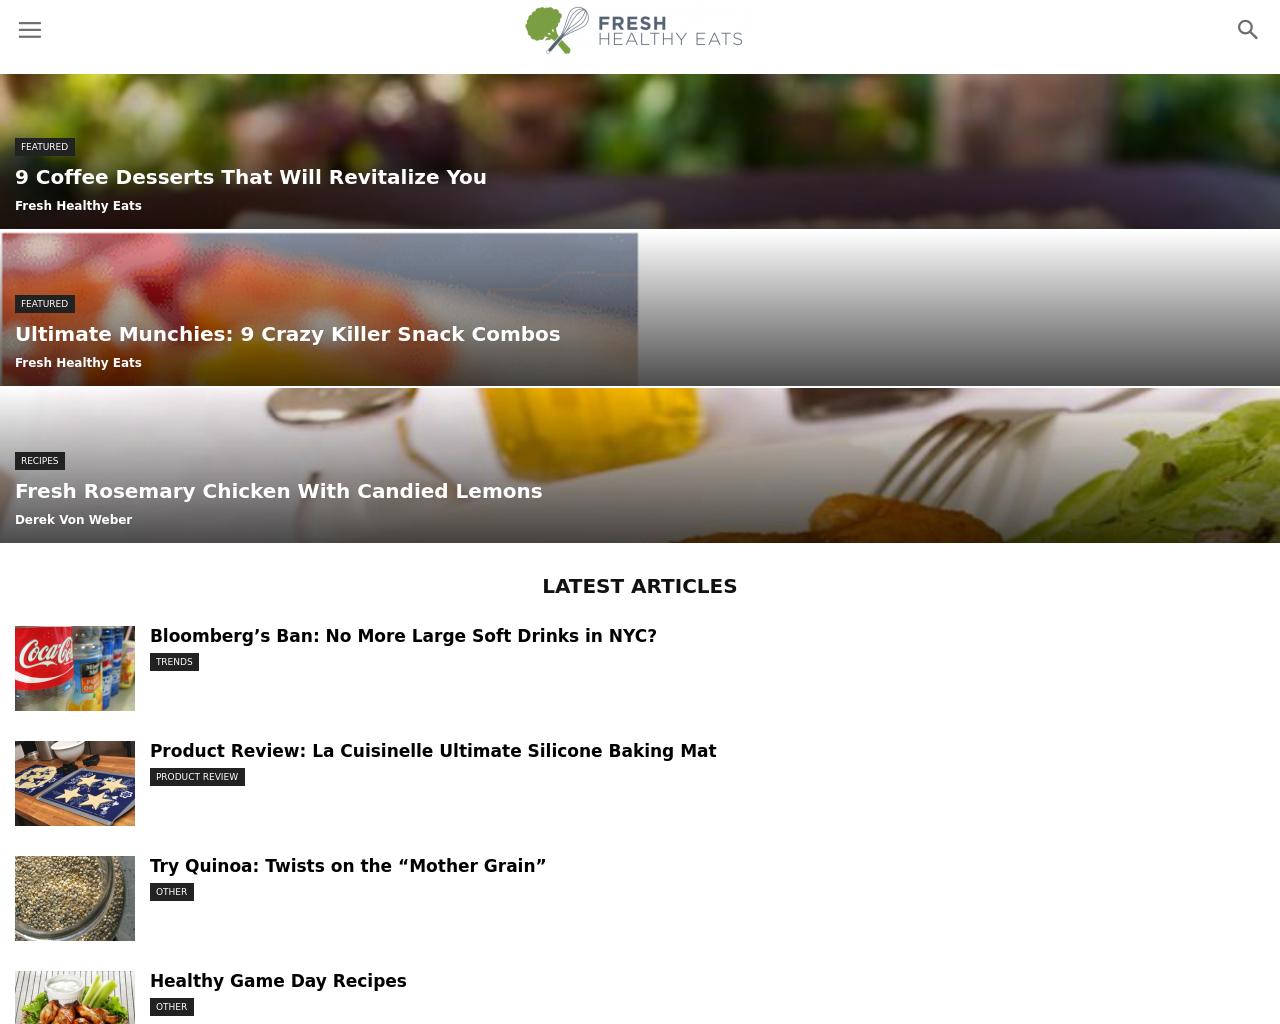 Fresh-Healthy-Eats-Advertising-Reviews-Pricing